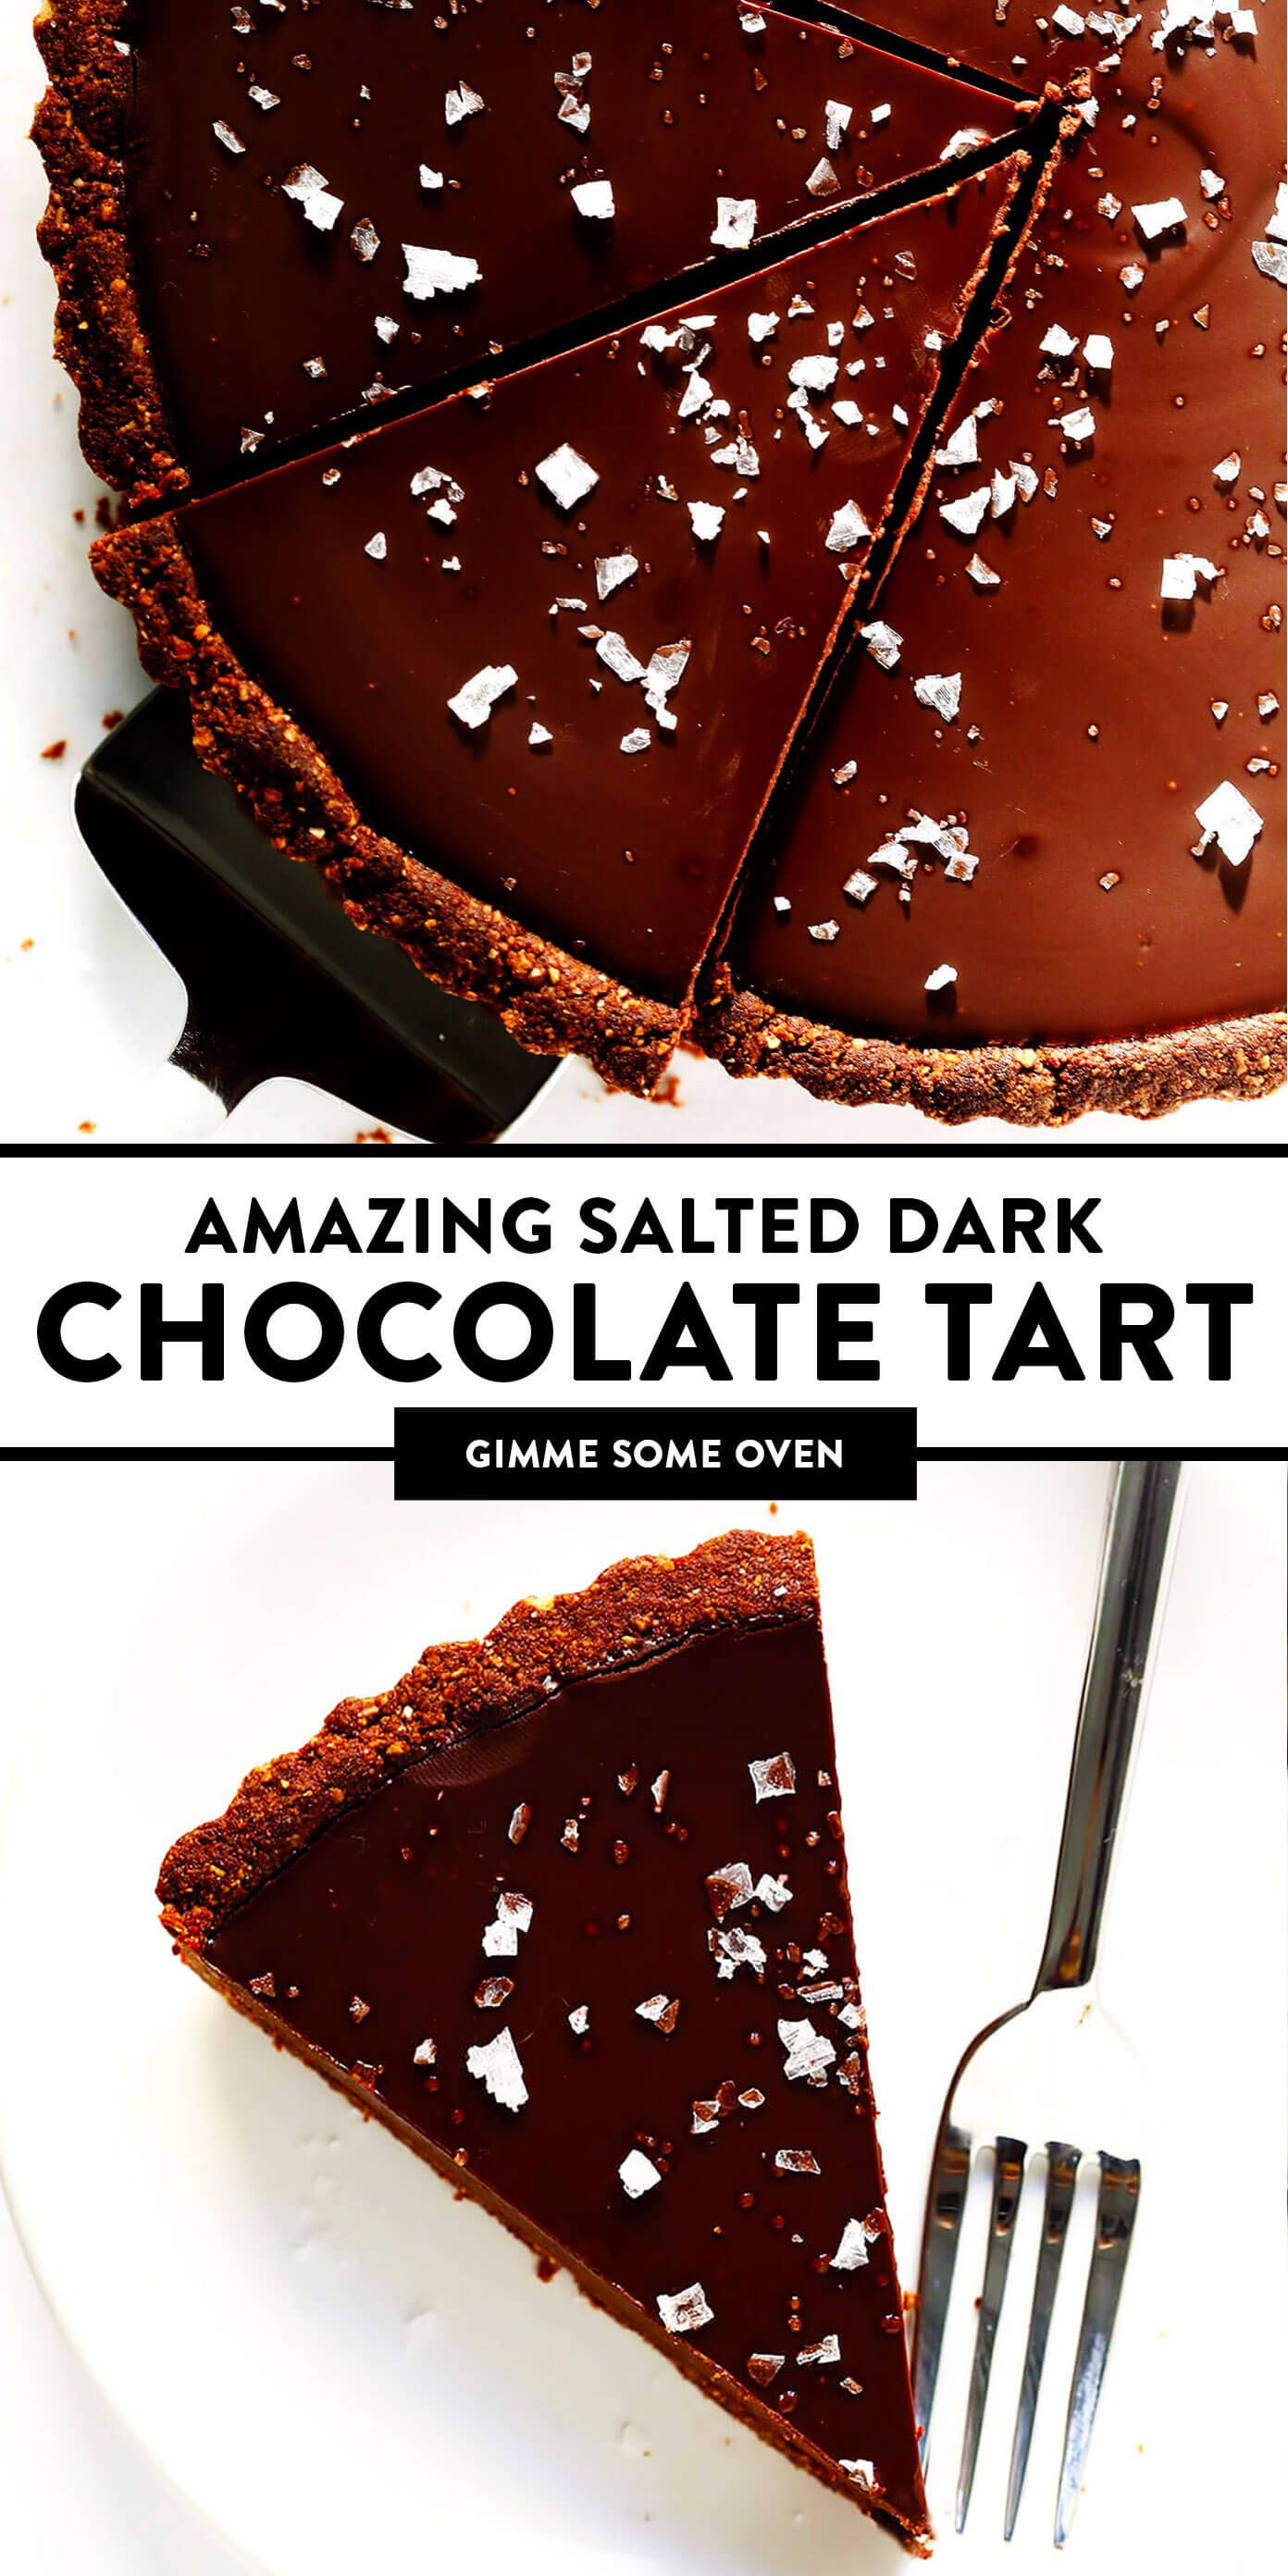 The Most Amazing Salted Dark Chocolate Tart | Gimm